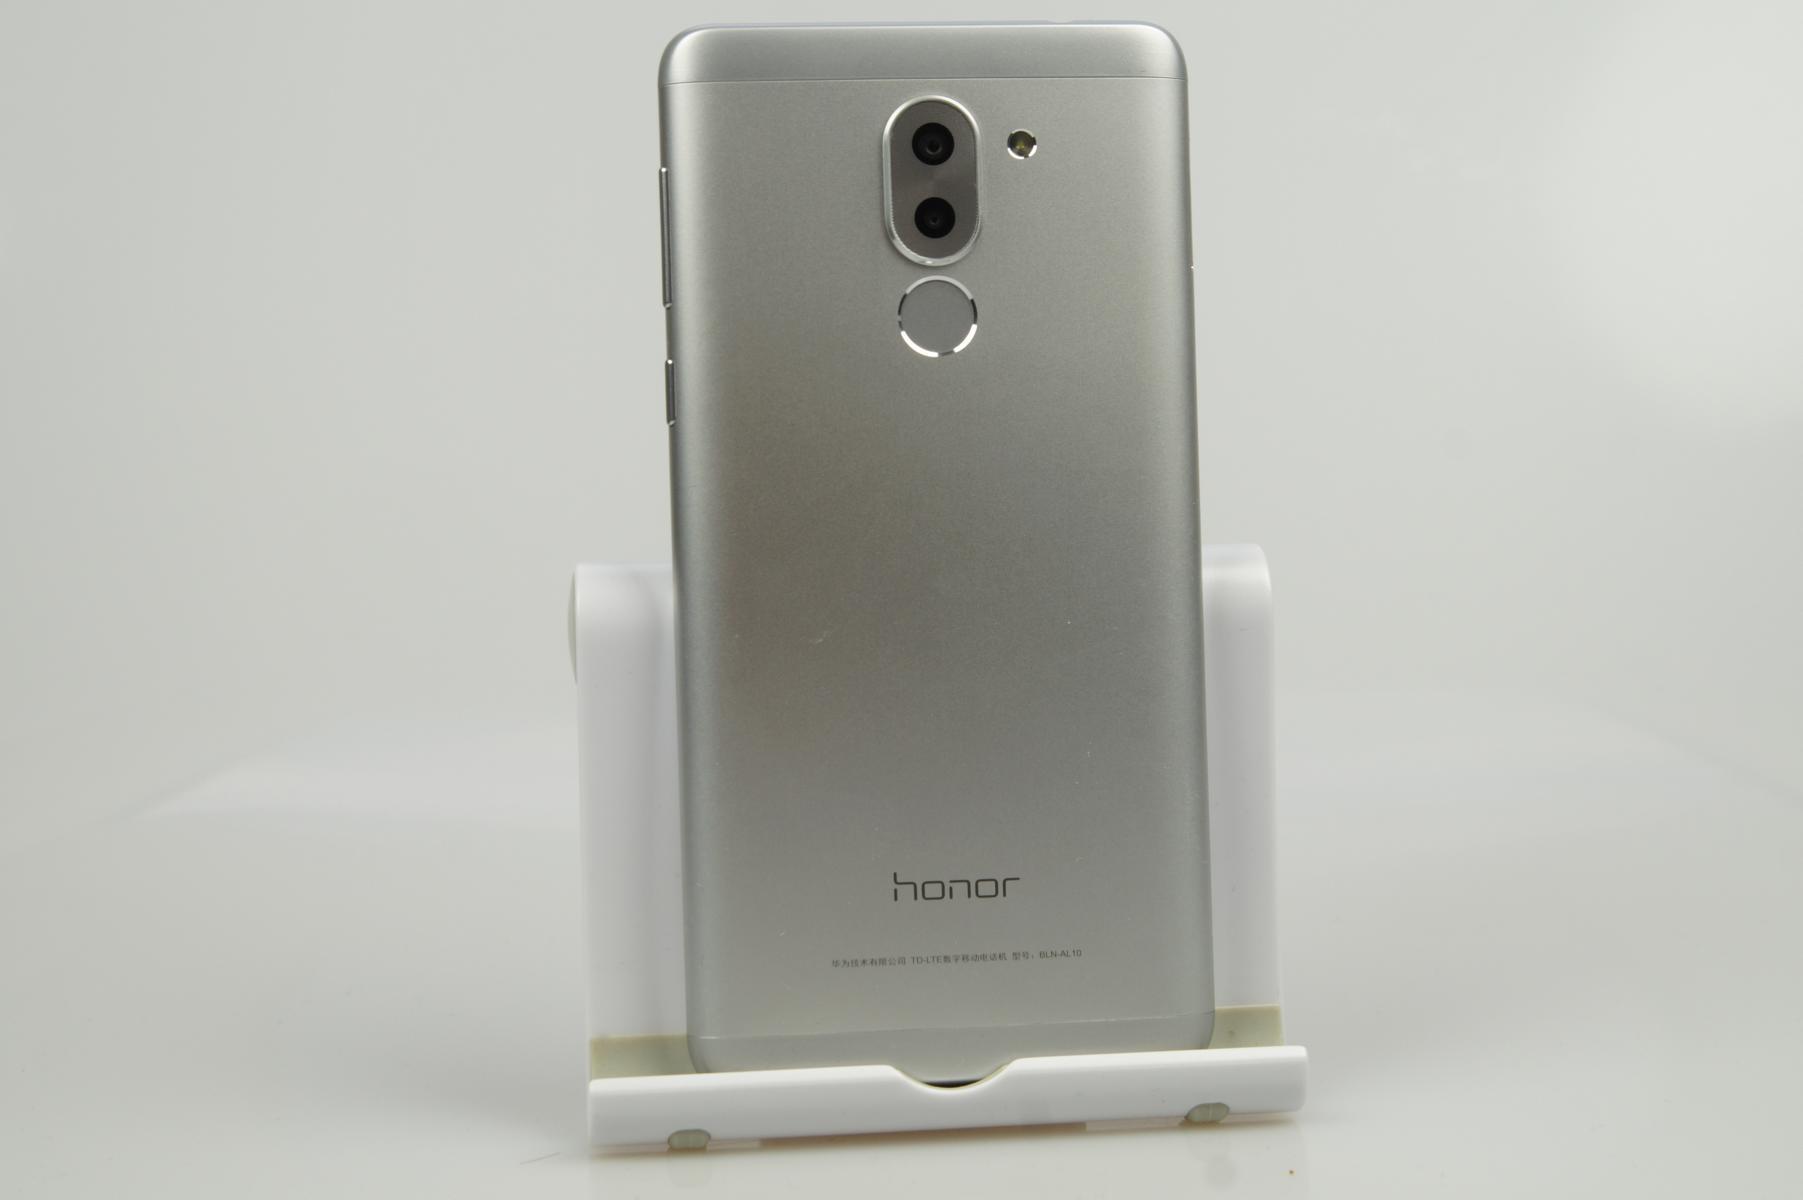 Honor 6X testbericht